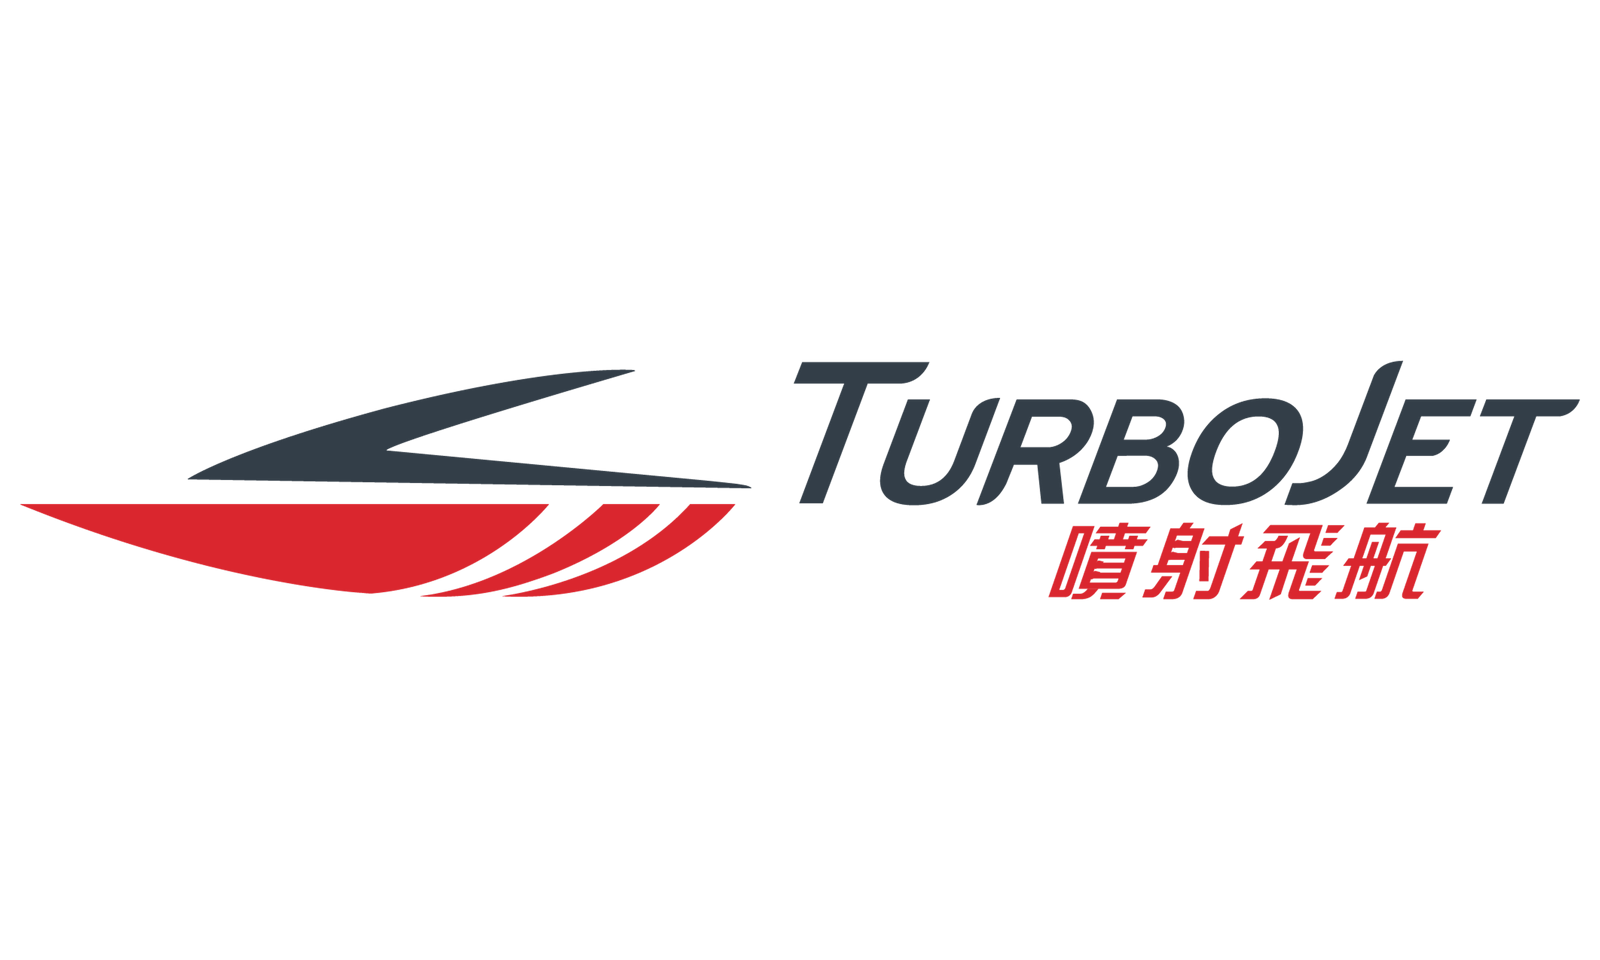 turbojetLogo